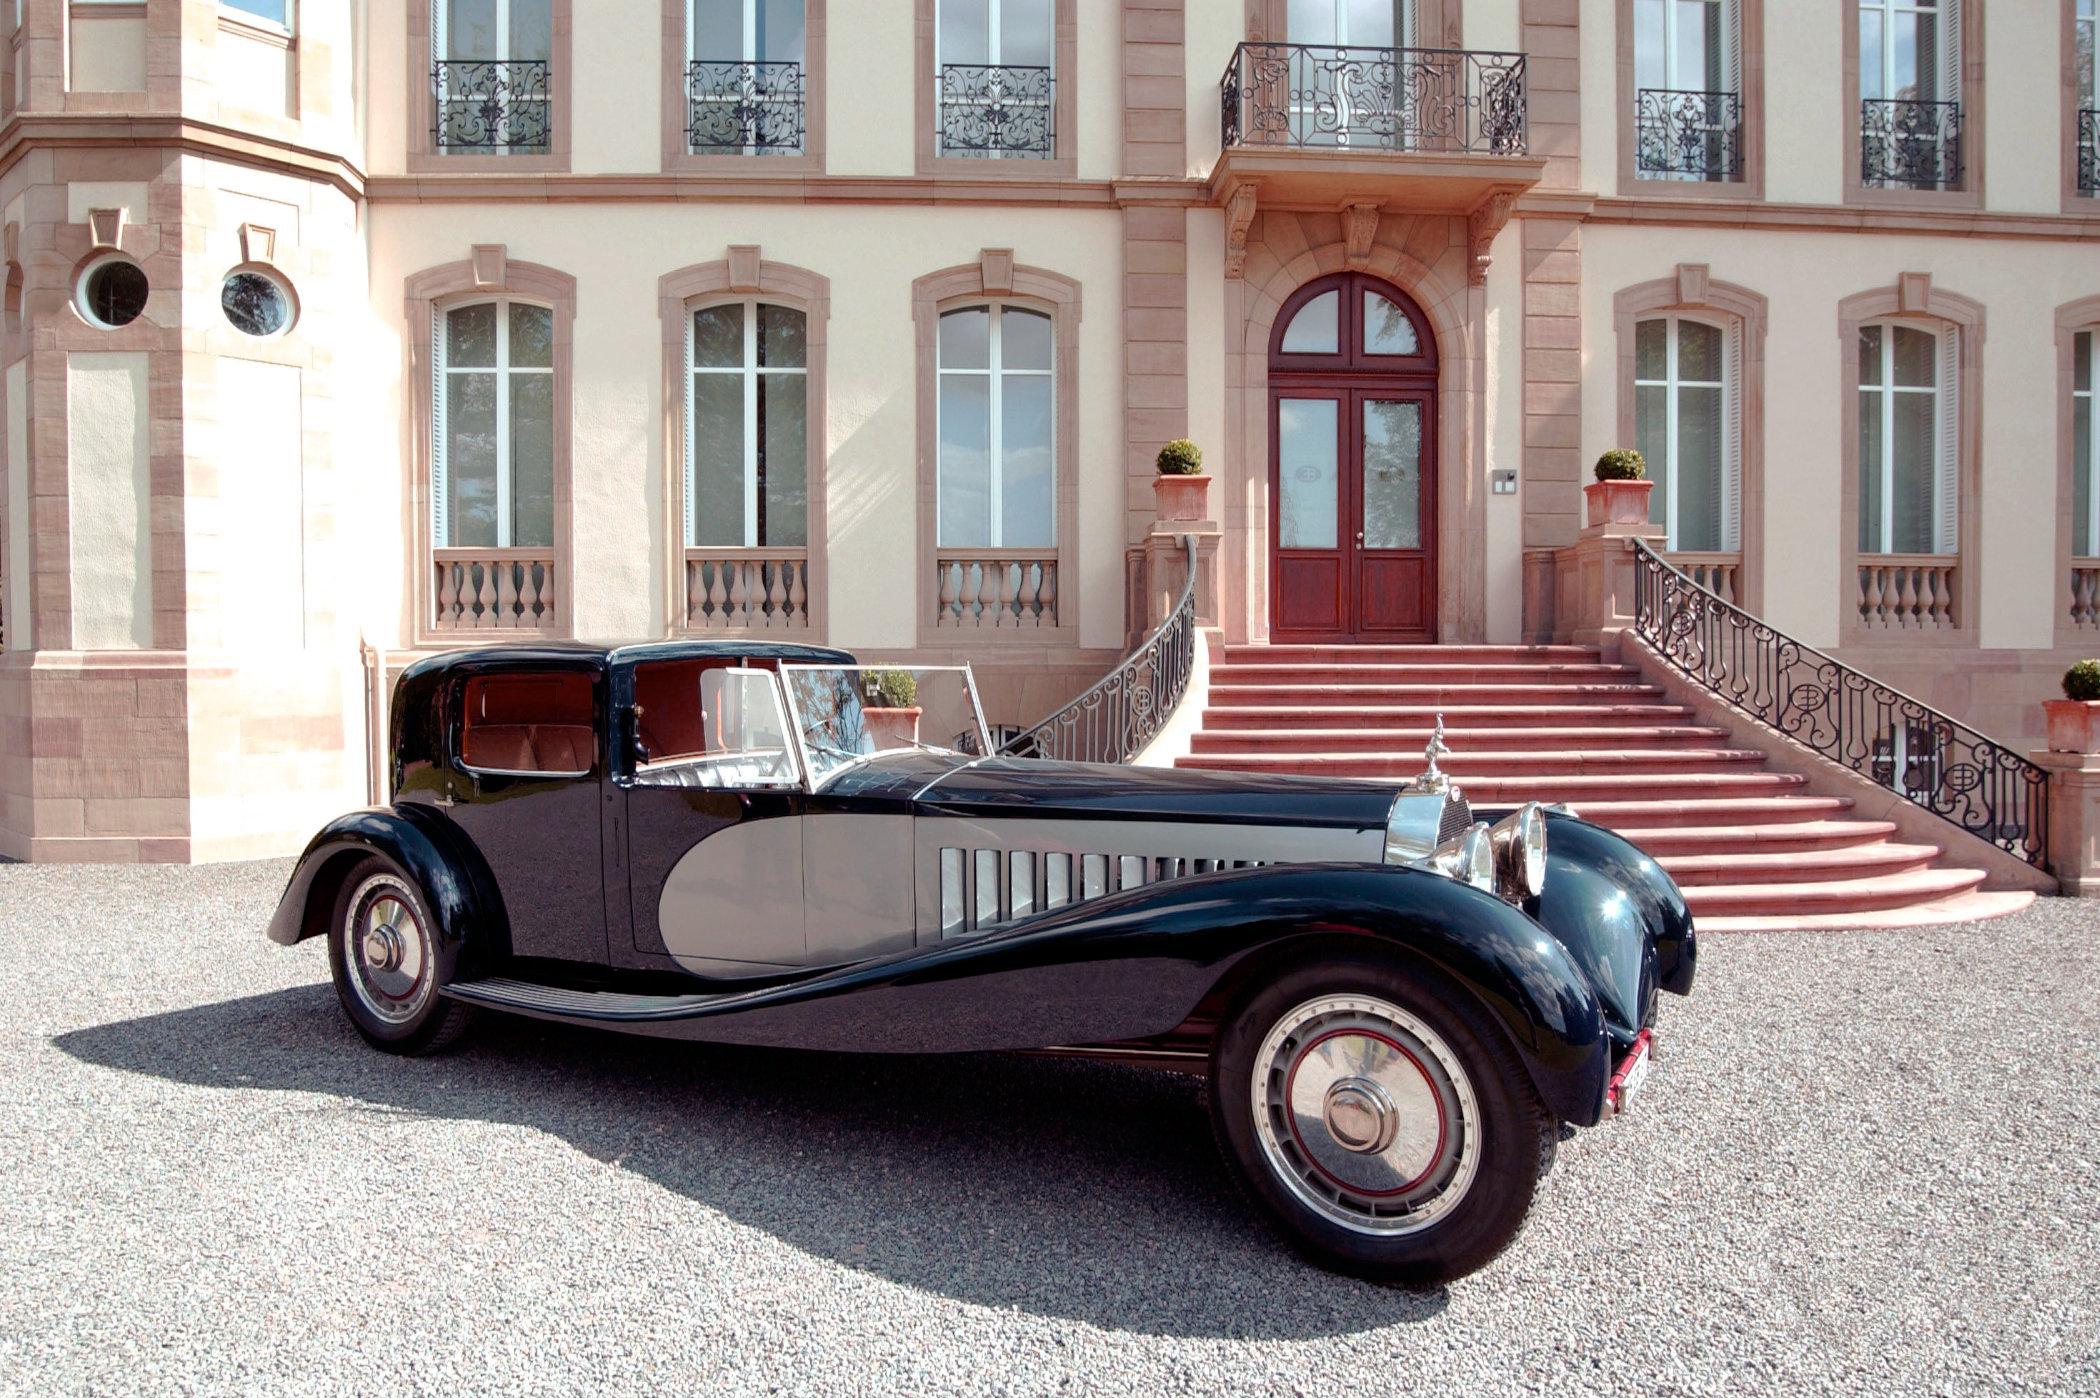 The Bugatti Type 41 Royale